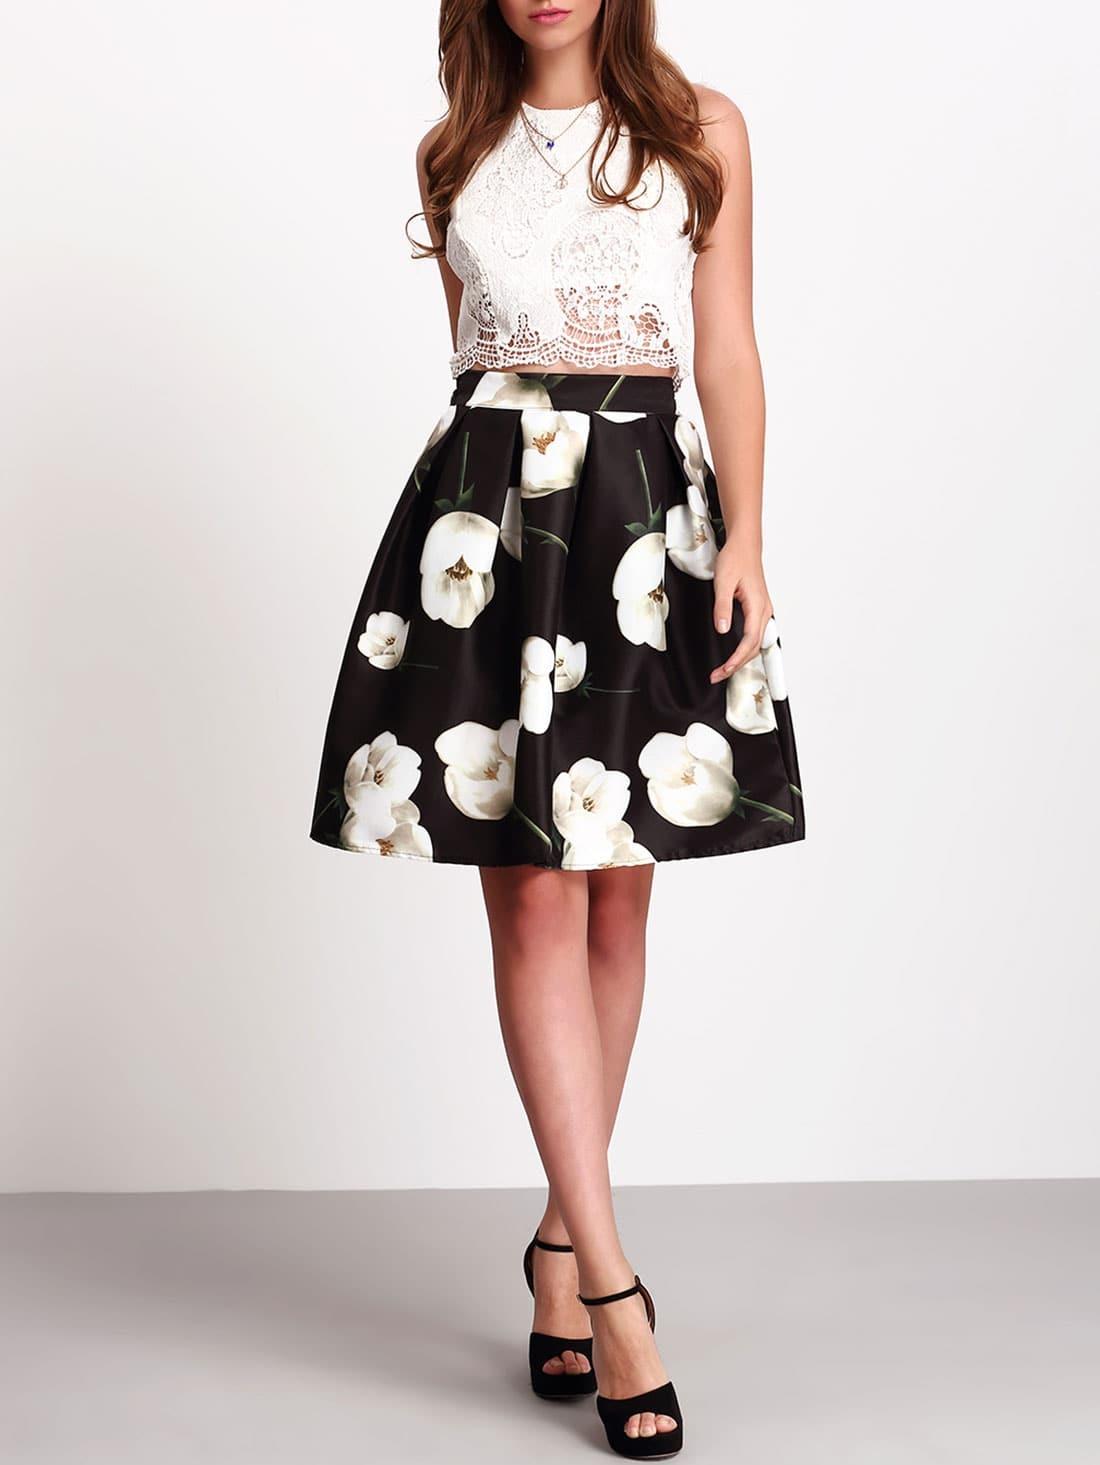 jupe motif fleuri taille haute noir french romwe. Black Bedroom Furniture Sets. Home Design Ideas